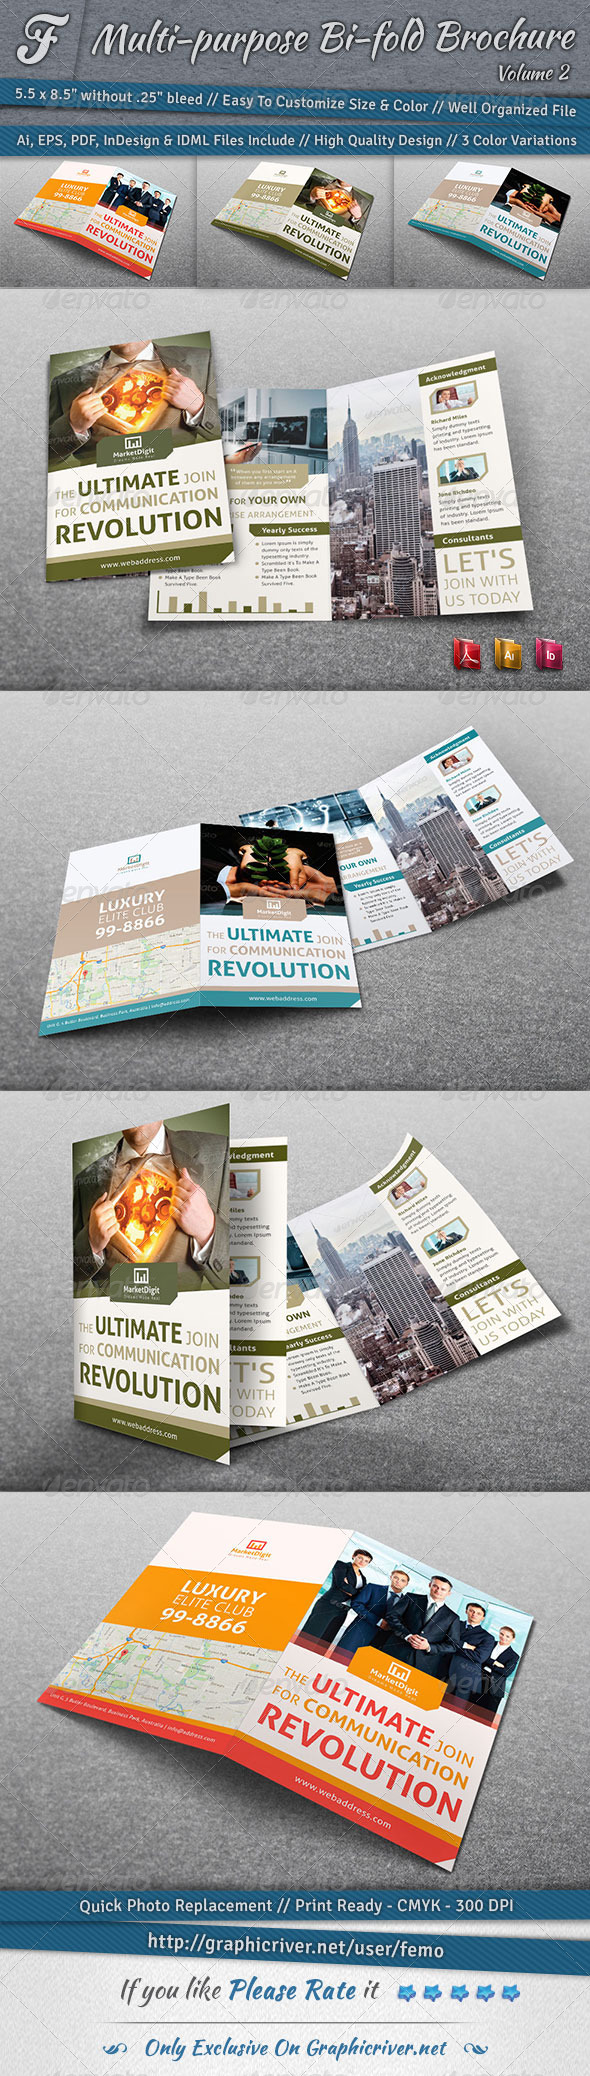 Multi-purpose Bi-fold Brochure | Volume 2 - Corporate Brochures